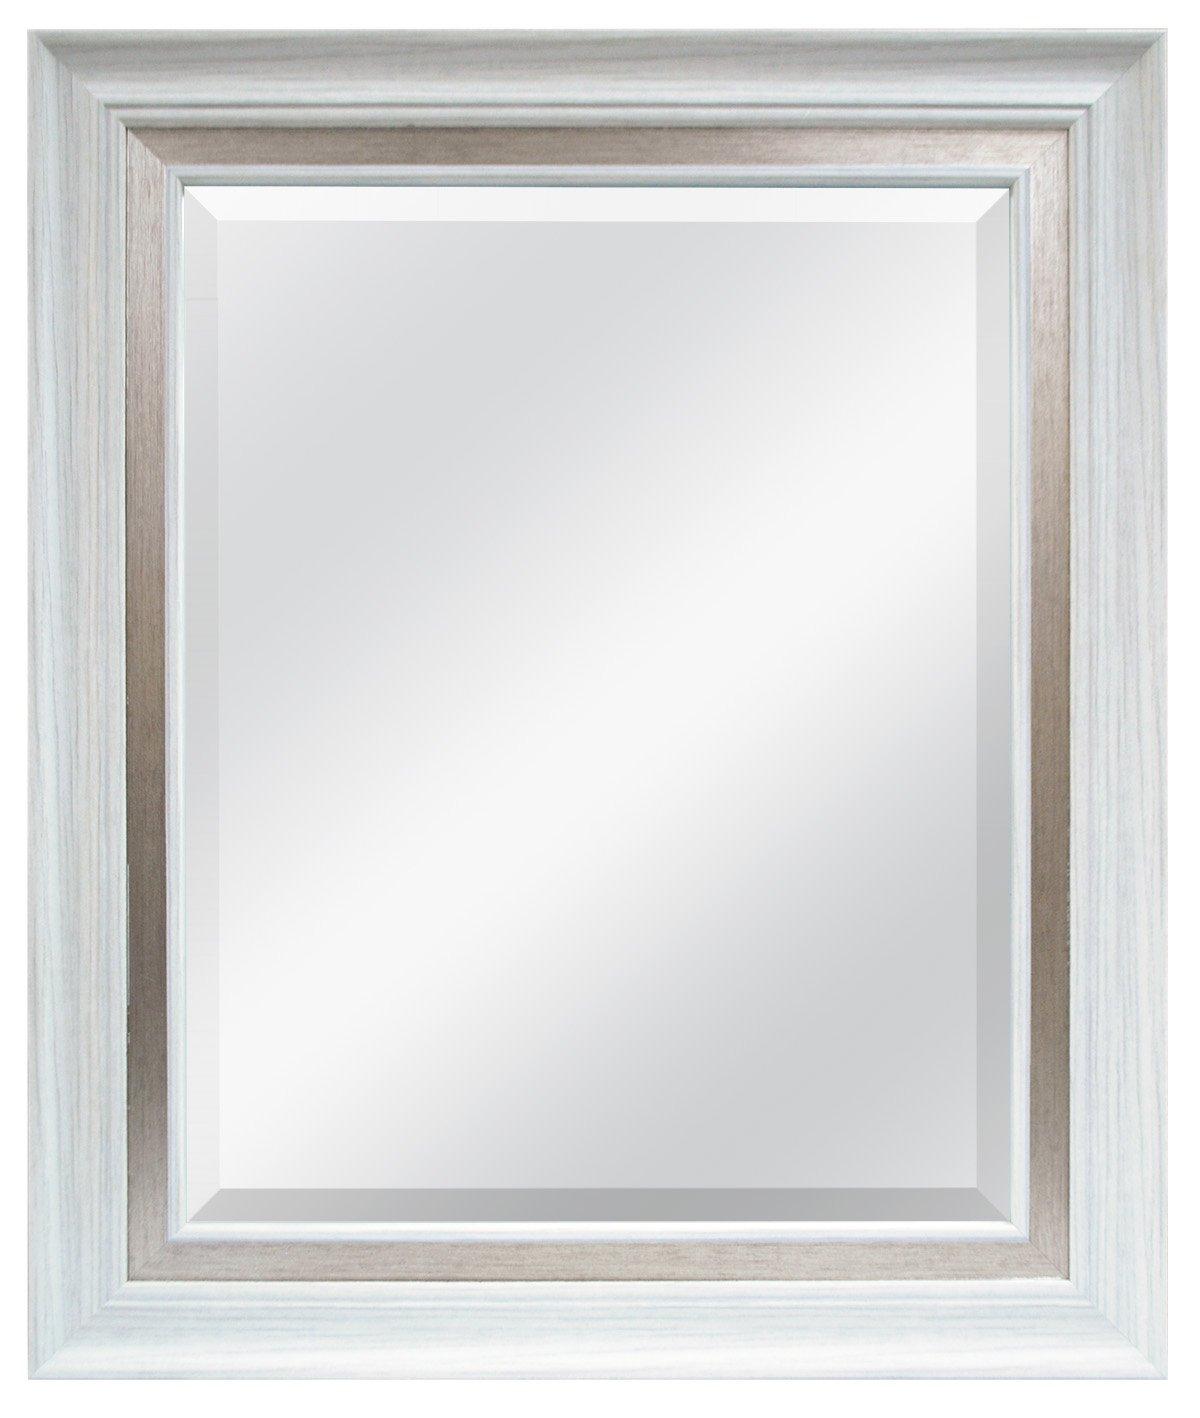 MCS 16x20 Inch Wall Mirror, 22x28 Inch Overall Size, White Woodgrain (47691)